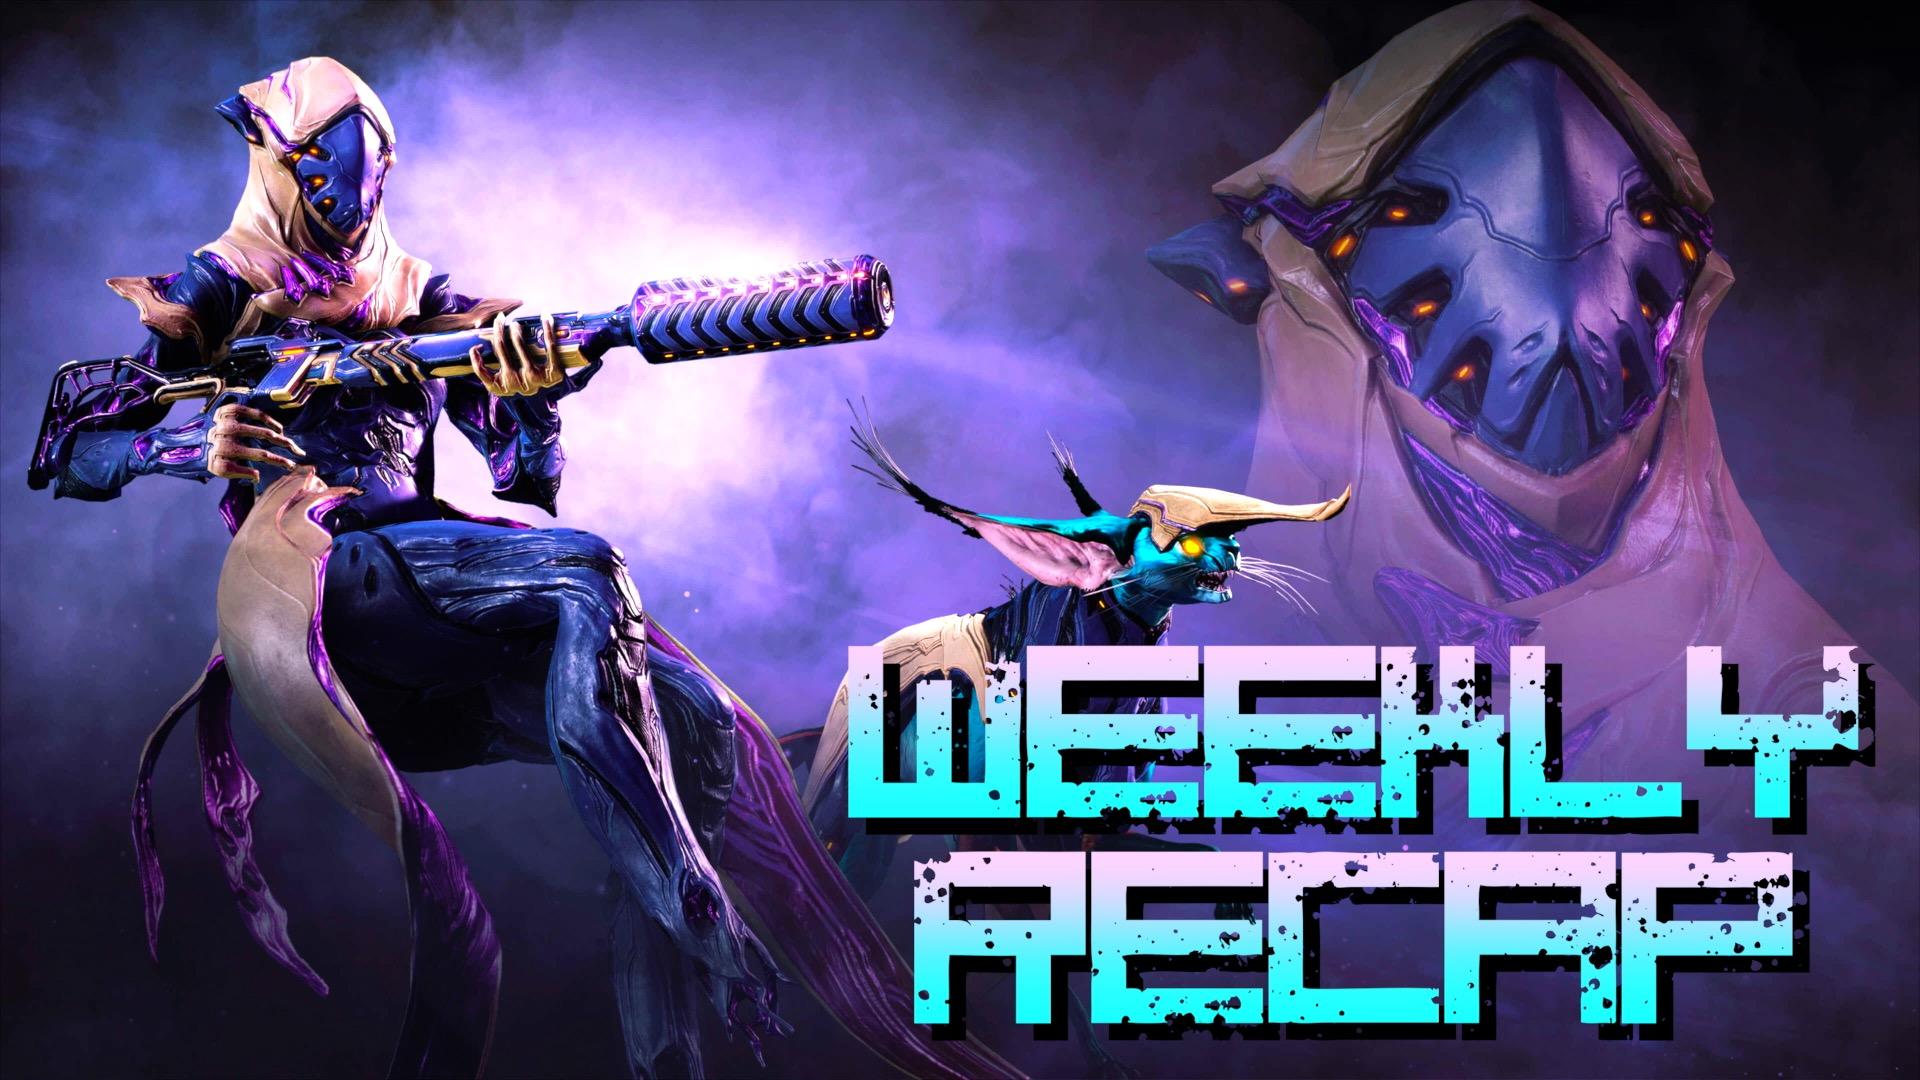 Weekly Recap #362 May 24th - Warframe, Hearthstone, DCUO